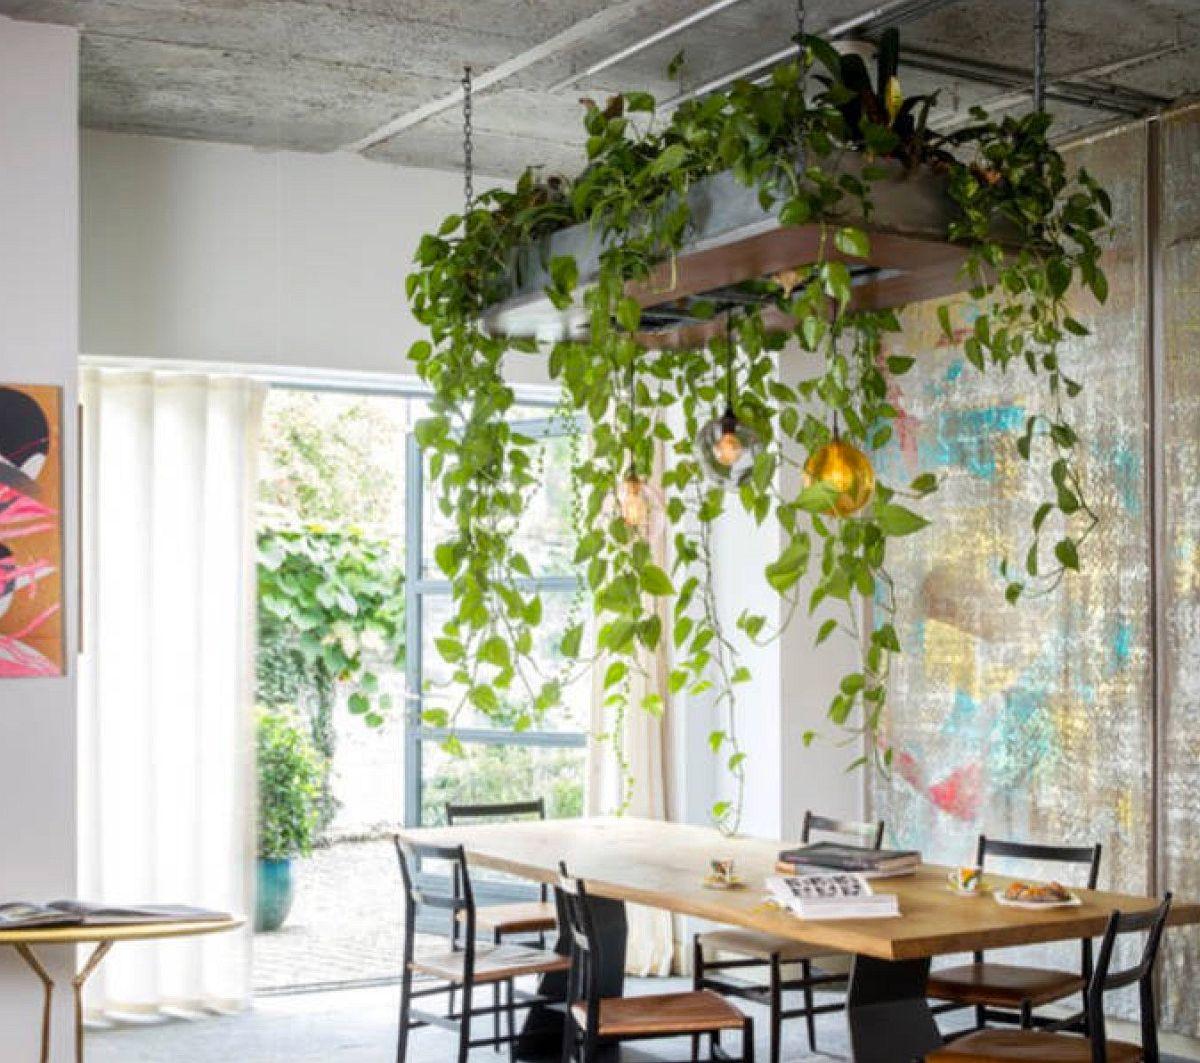 adelaparvu.com despre idei de decorare a casei cu plante (2)